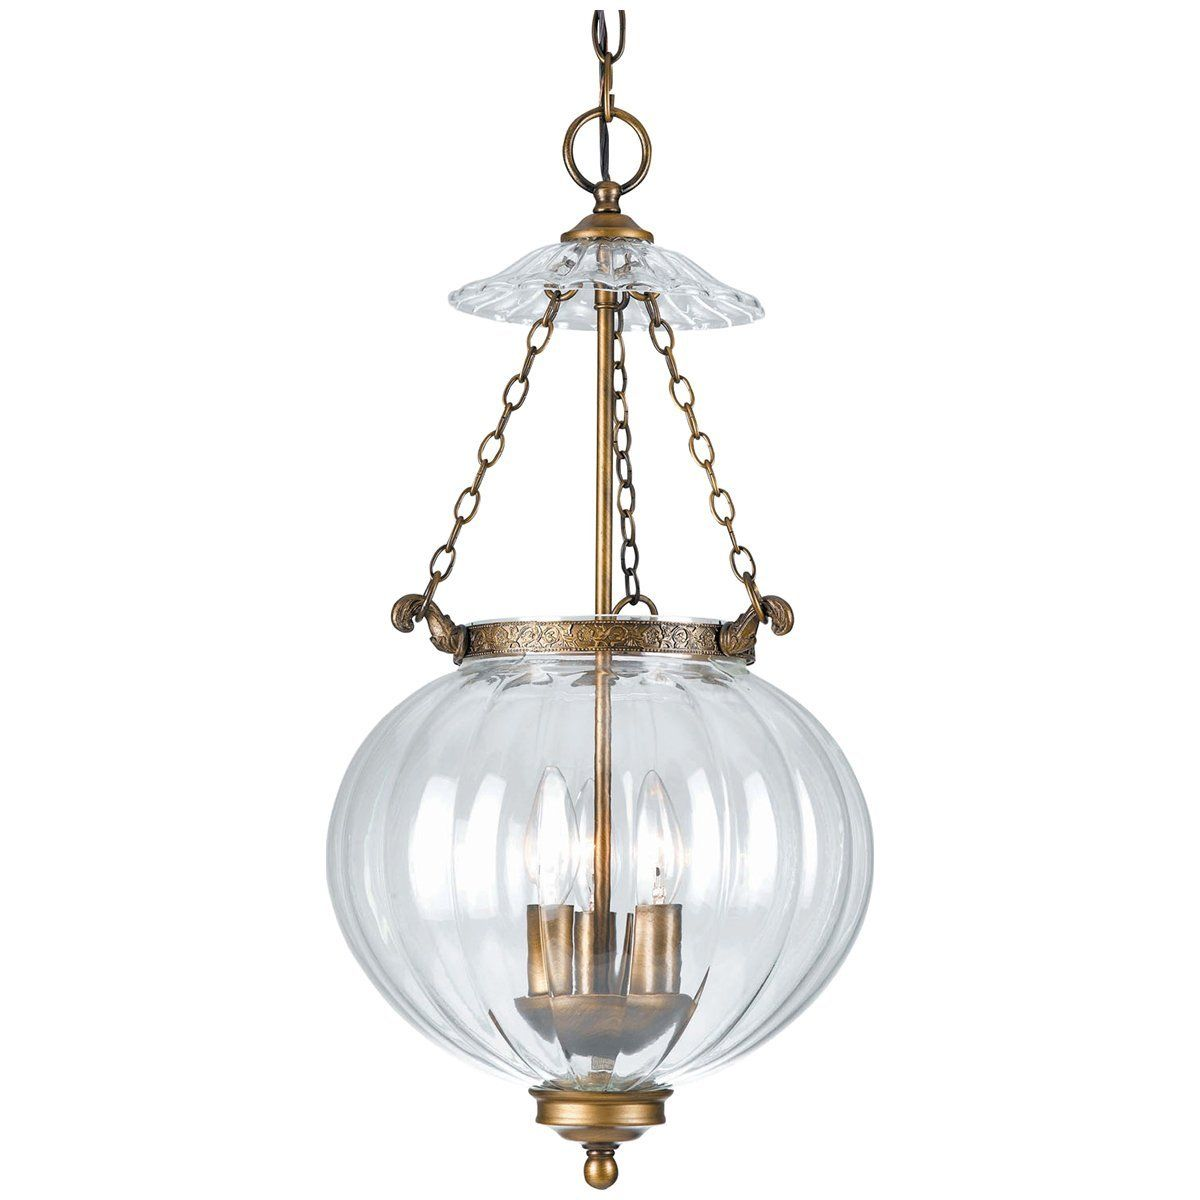 Crystorama lights brass glass pendant i products pinterest